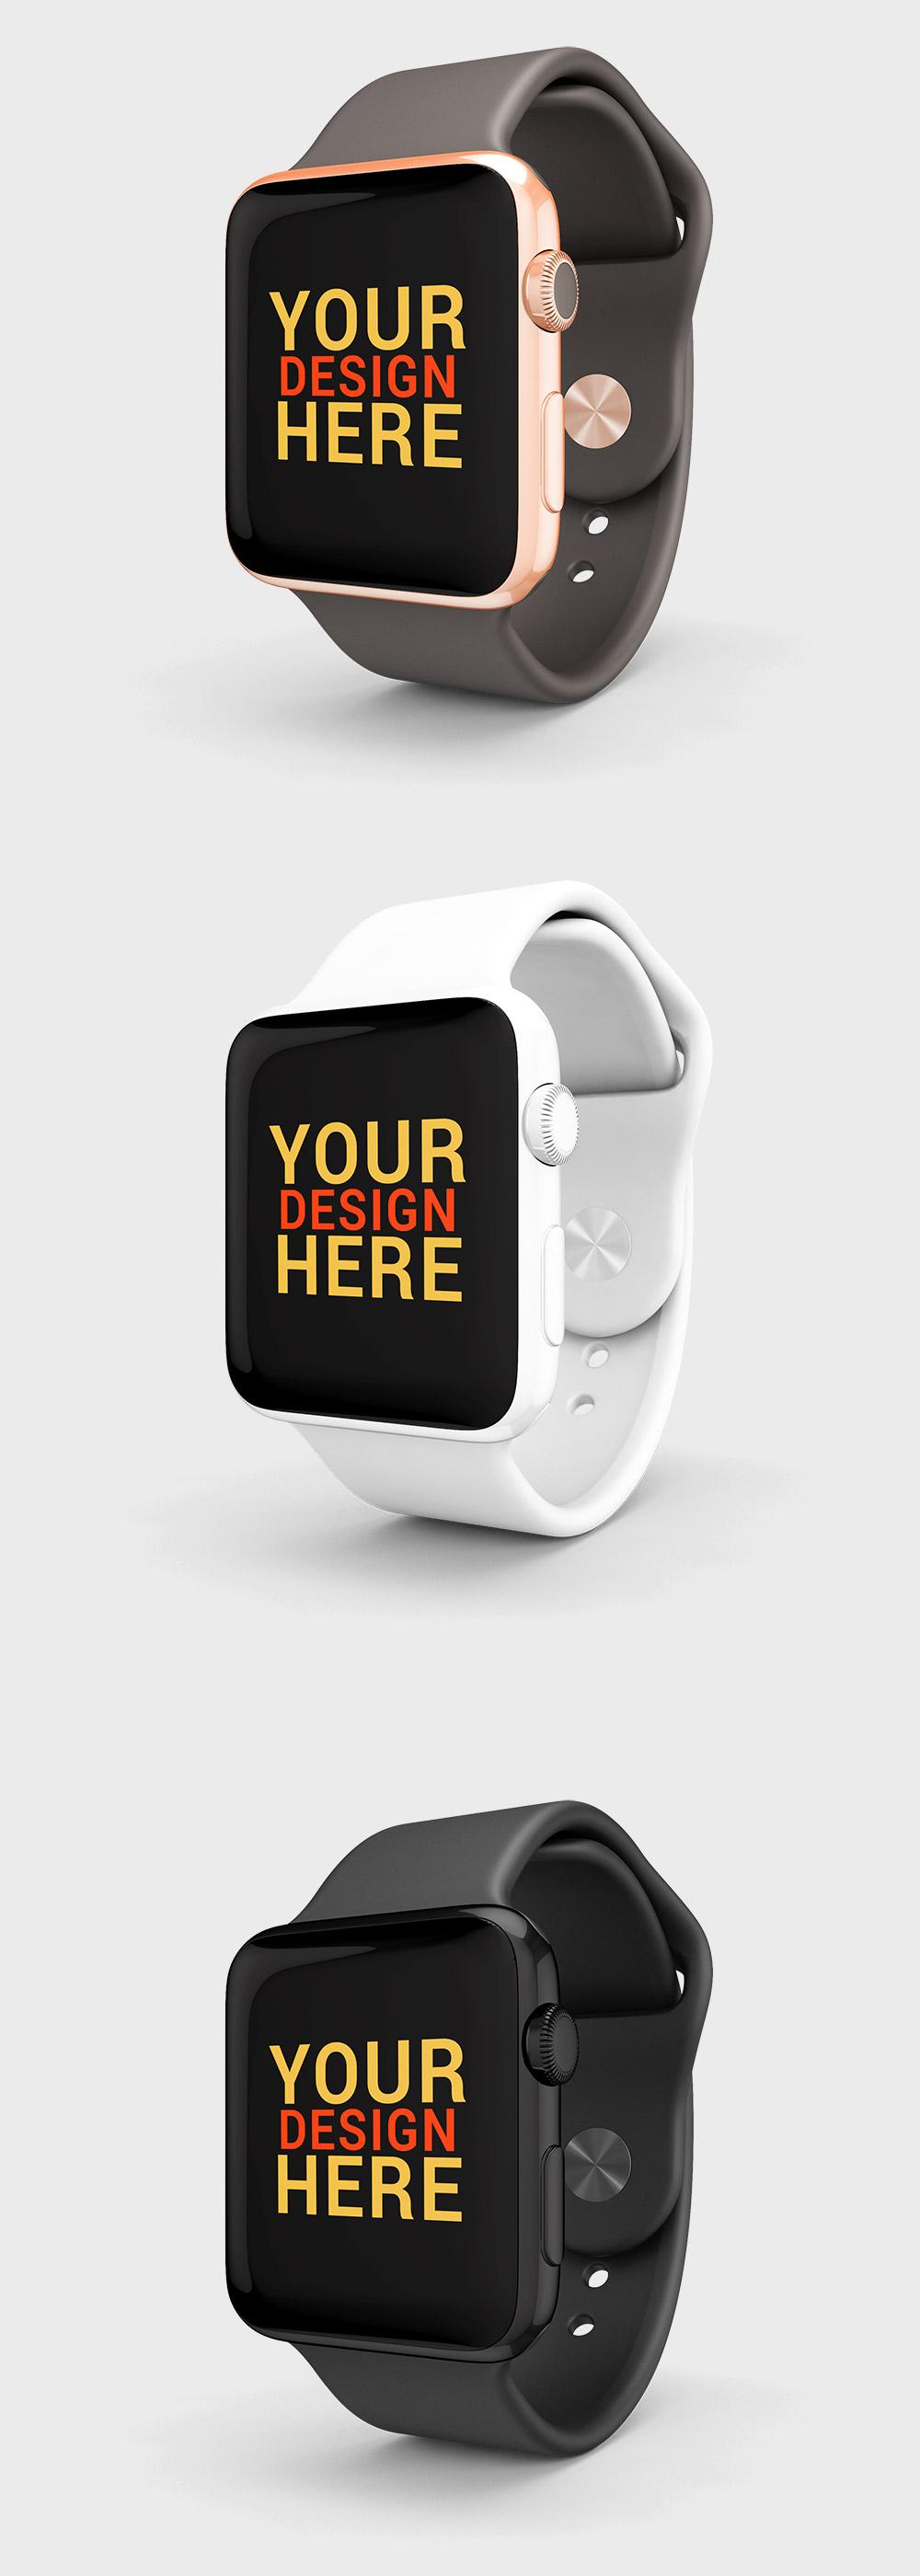 Free Apple Watch Mockup PSD